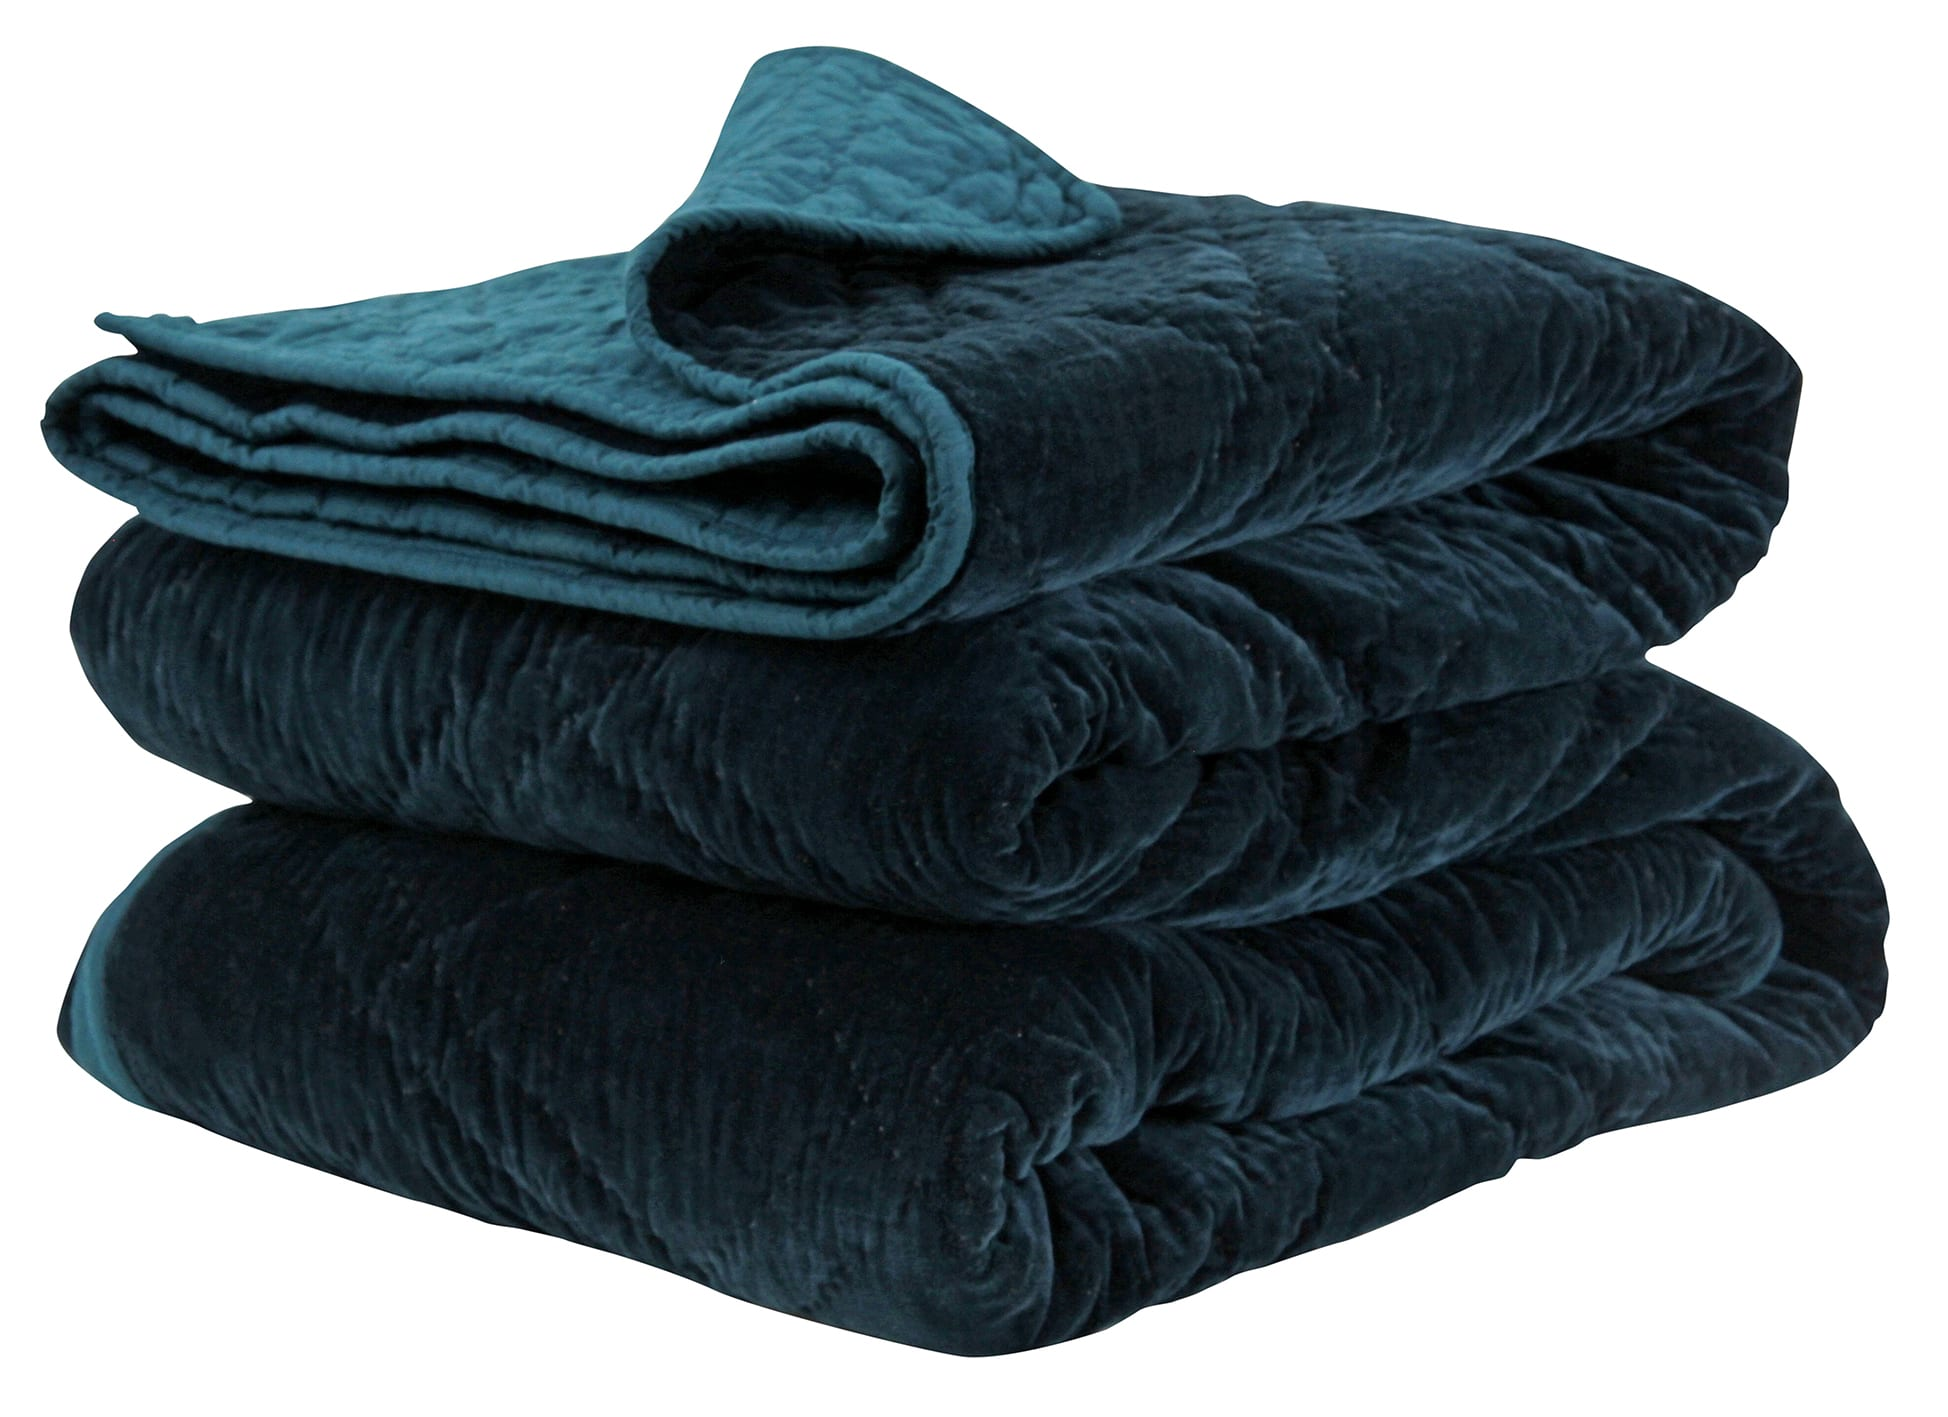 Wallace Cotton Large Peacock Plush Velvet Bedspread